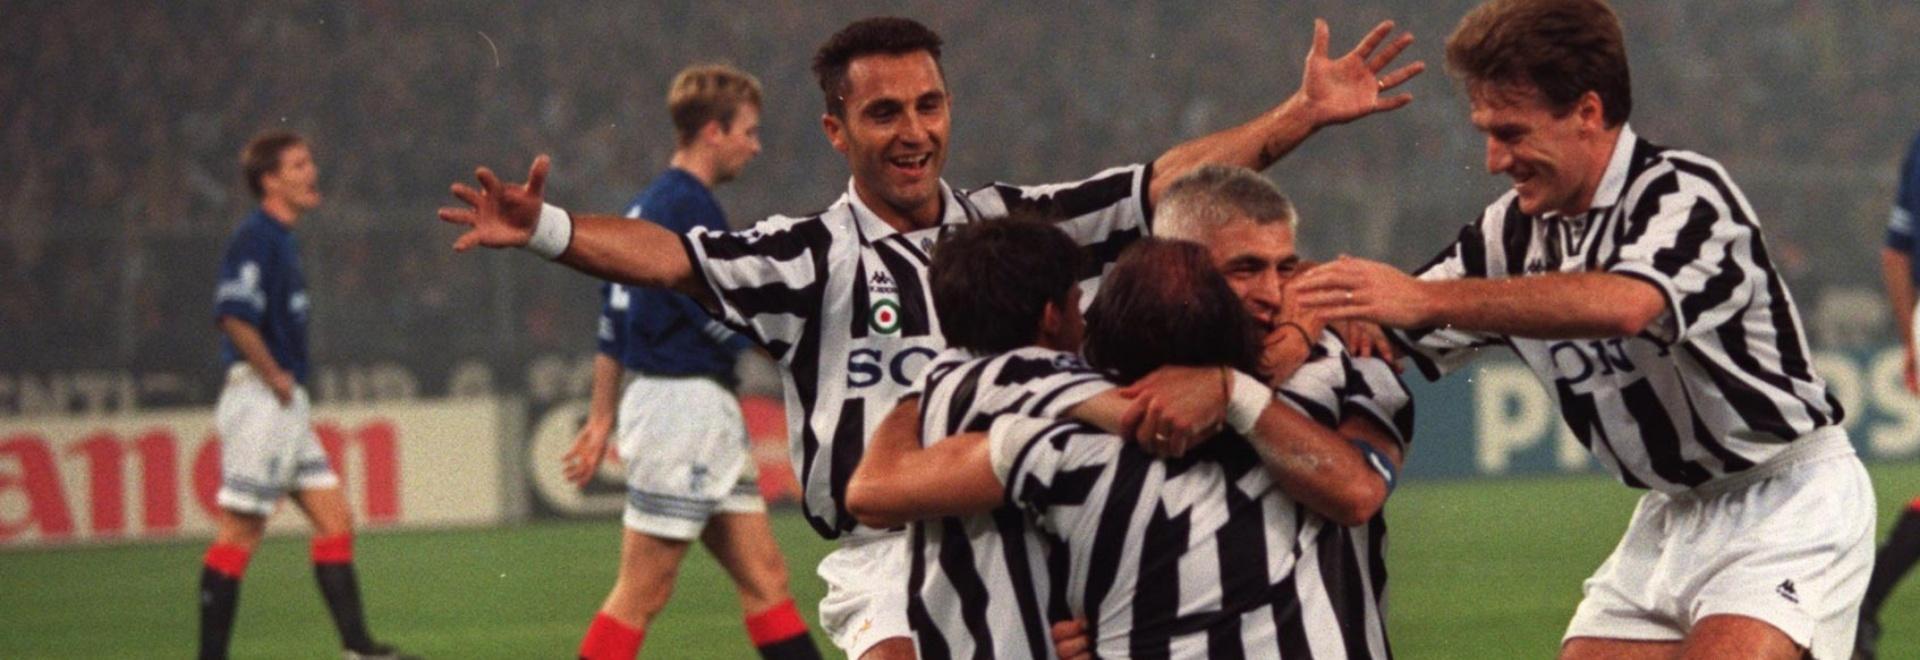 Road to Rome Juventus sul tetto d'Europa